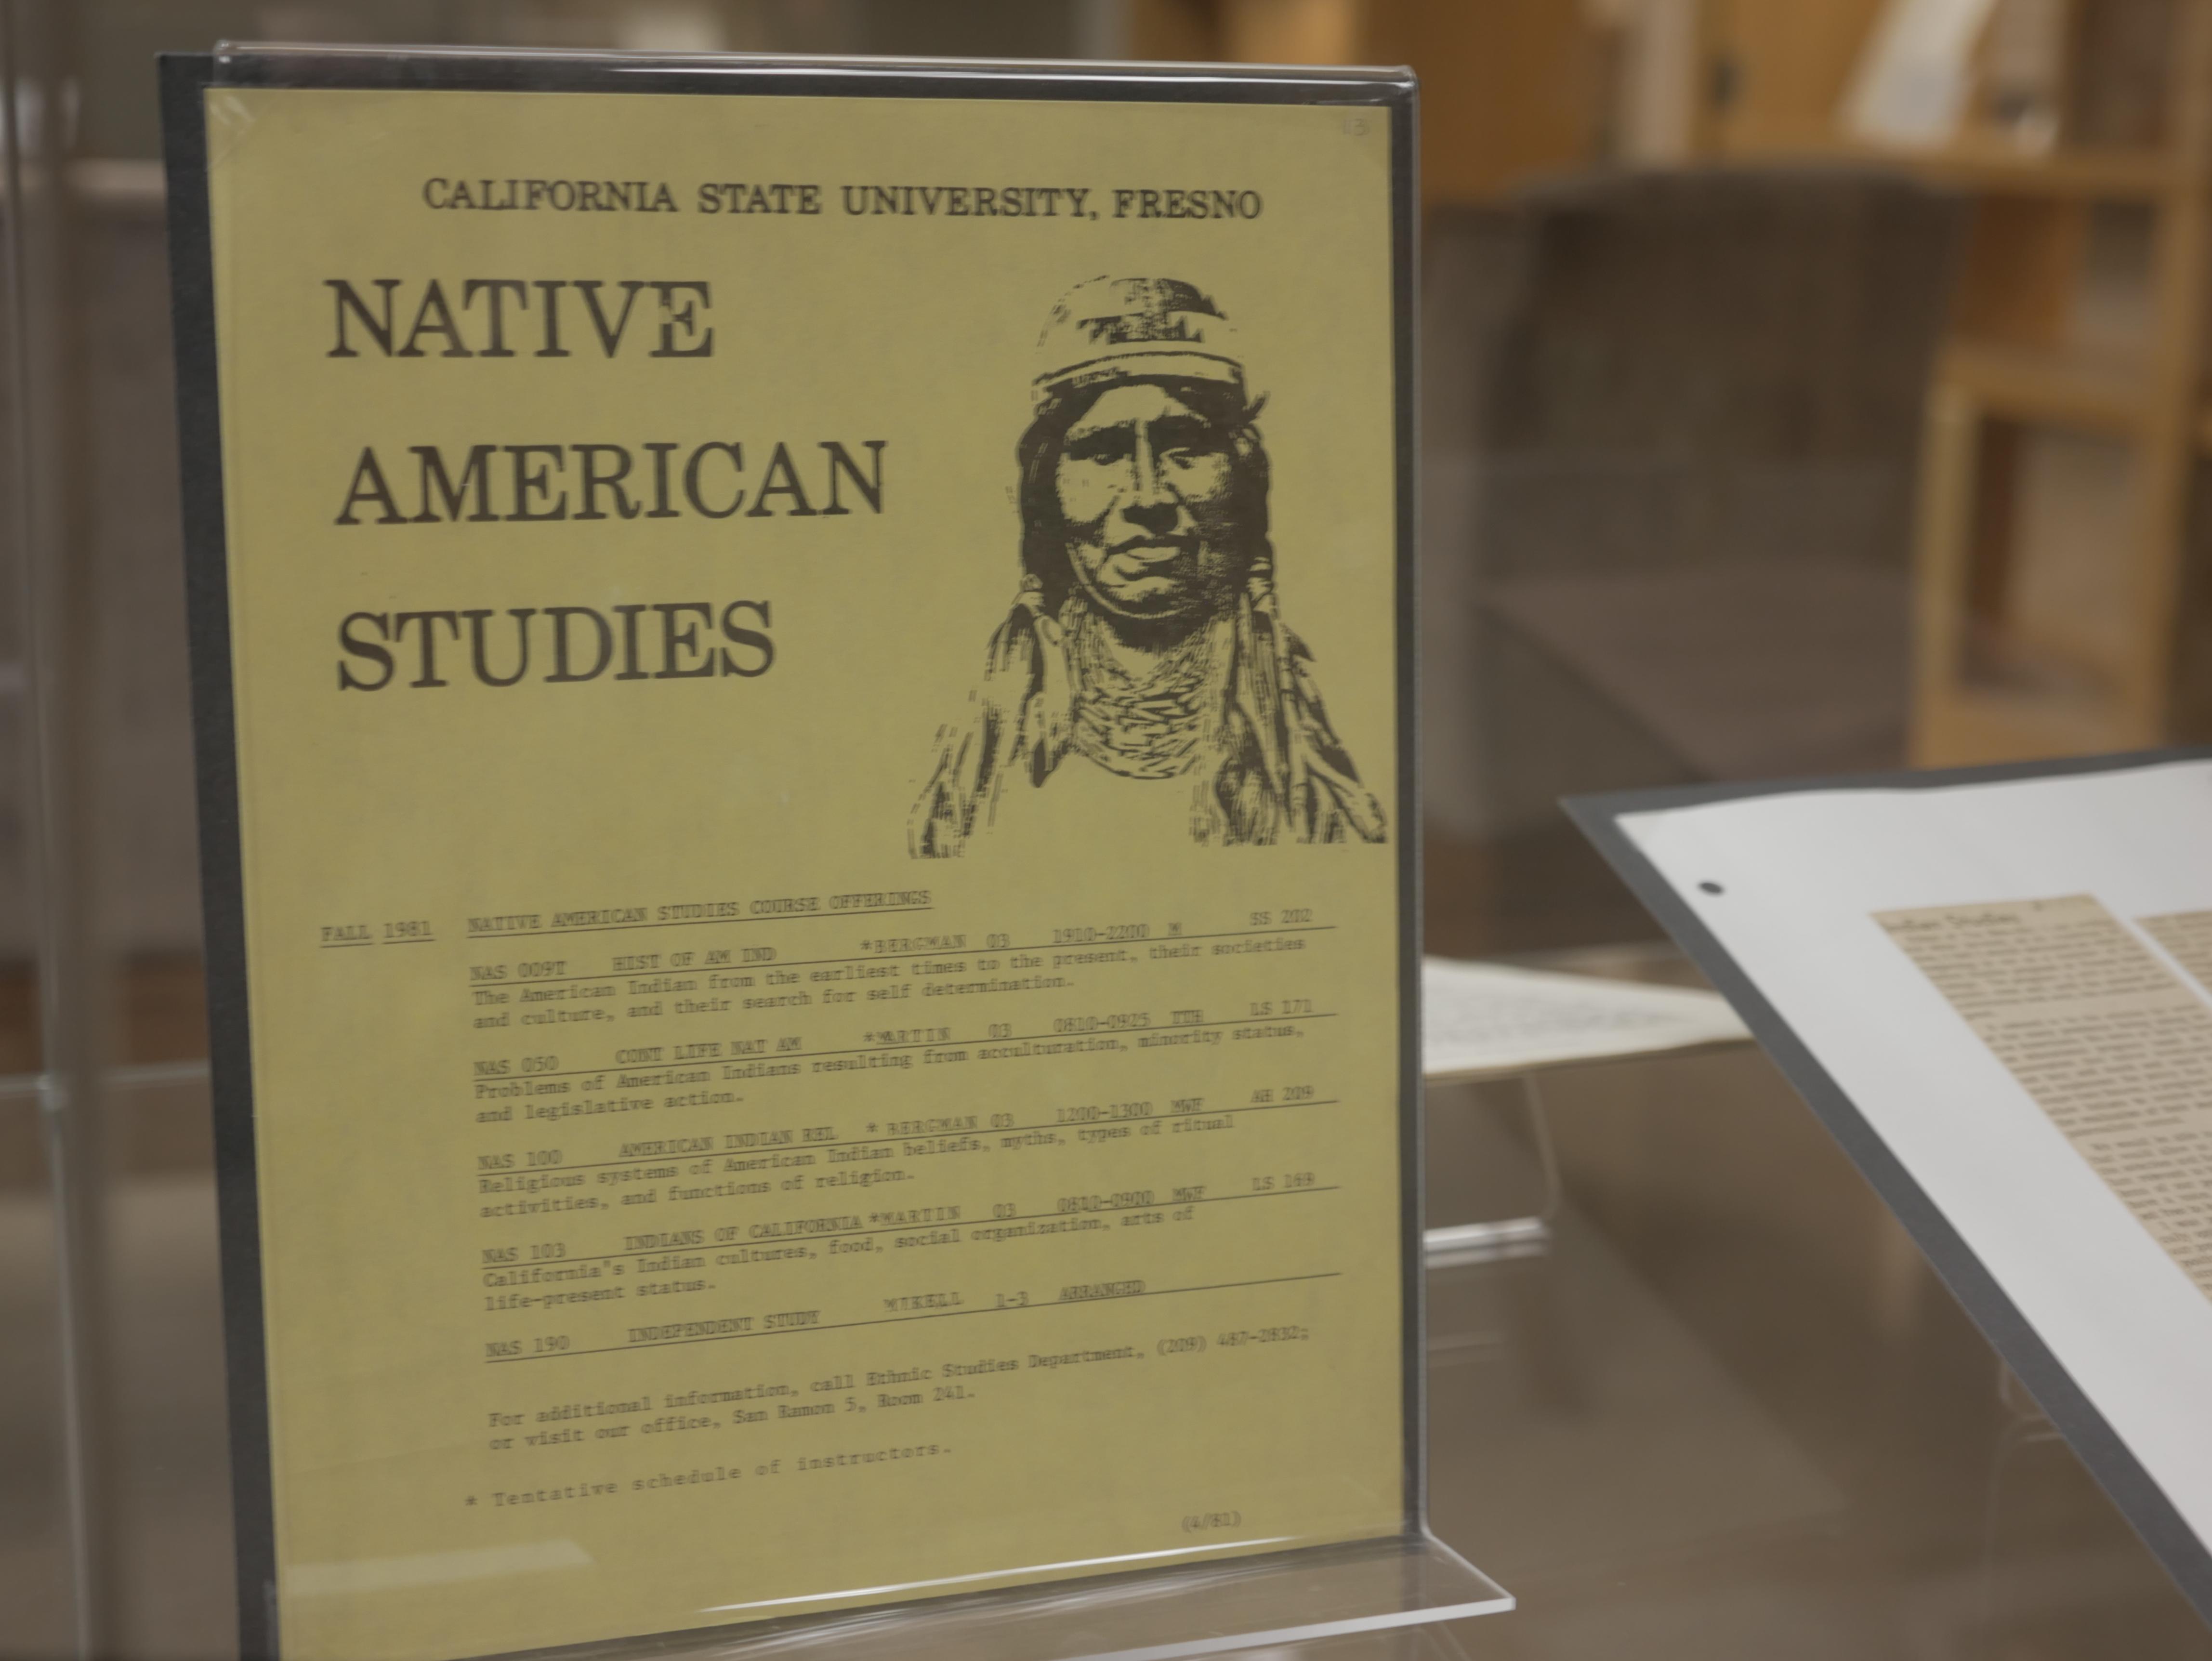 Native American Studies class offerings 1970s